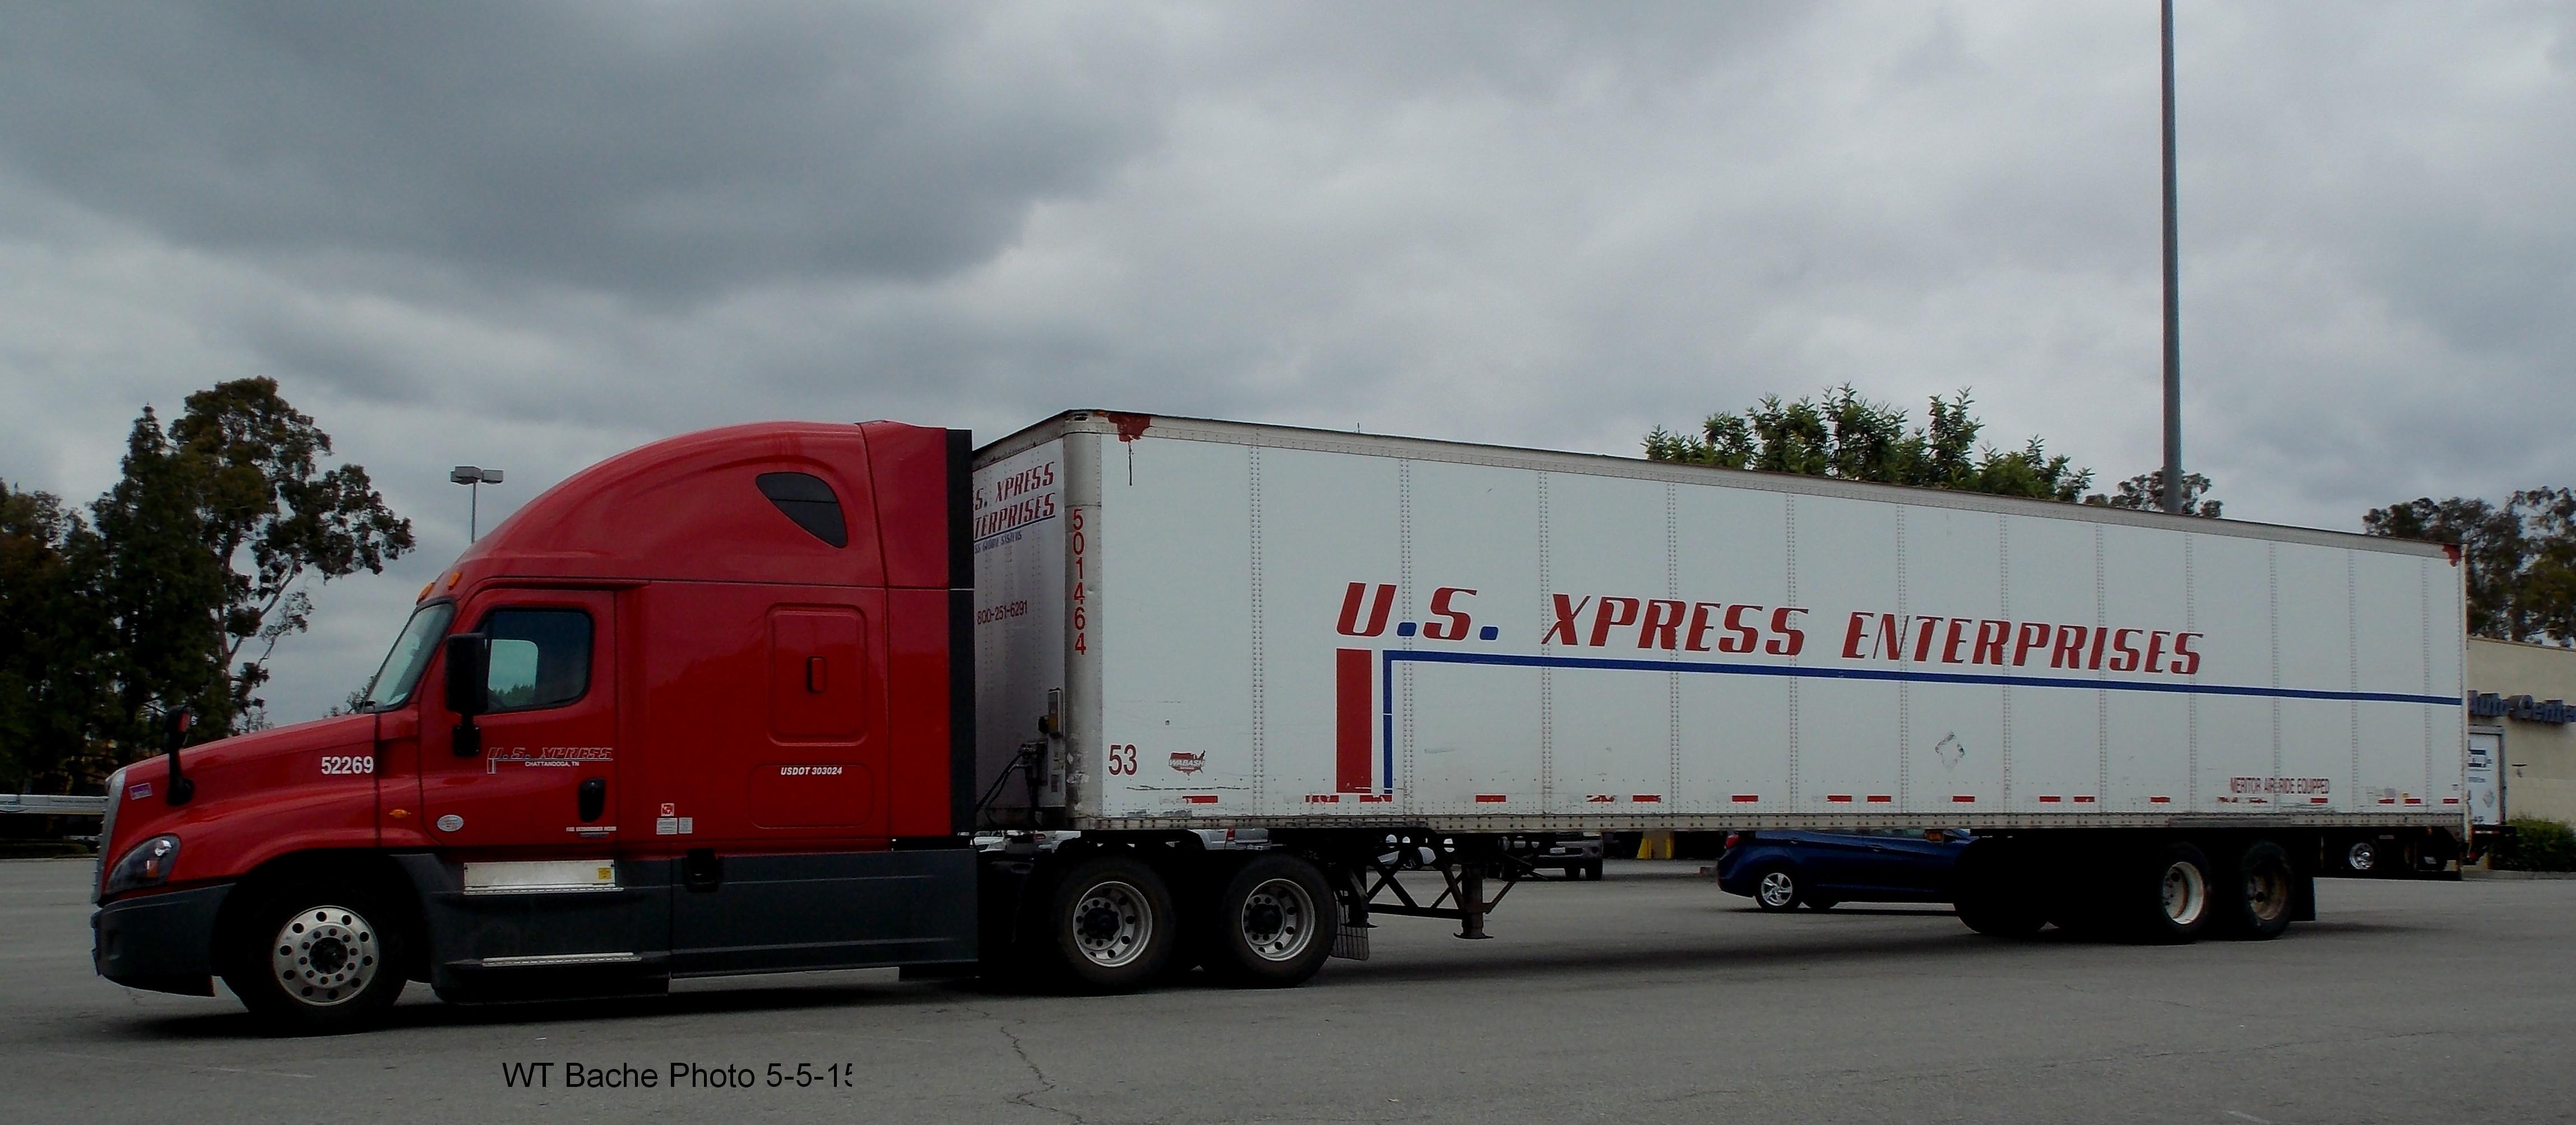 U.S. Xpress Enterprises